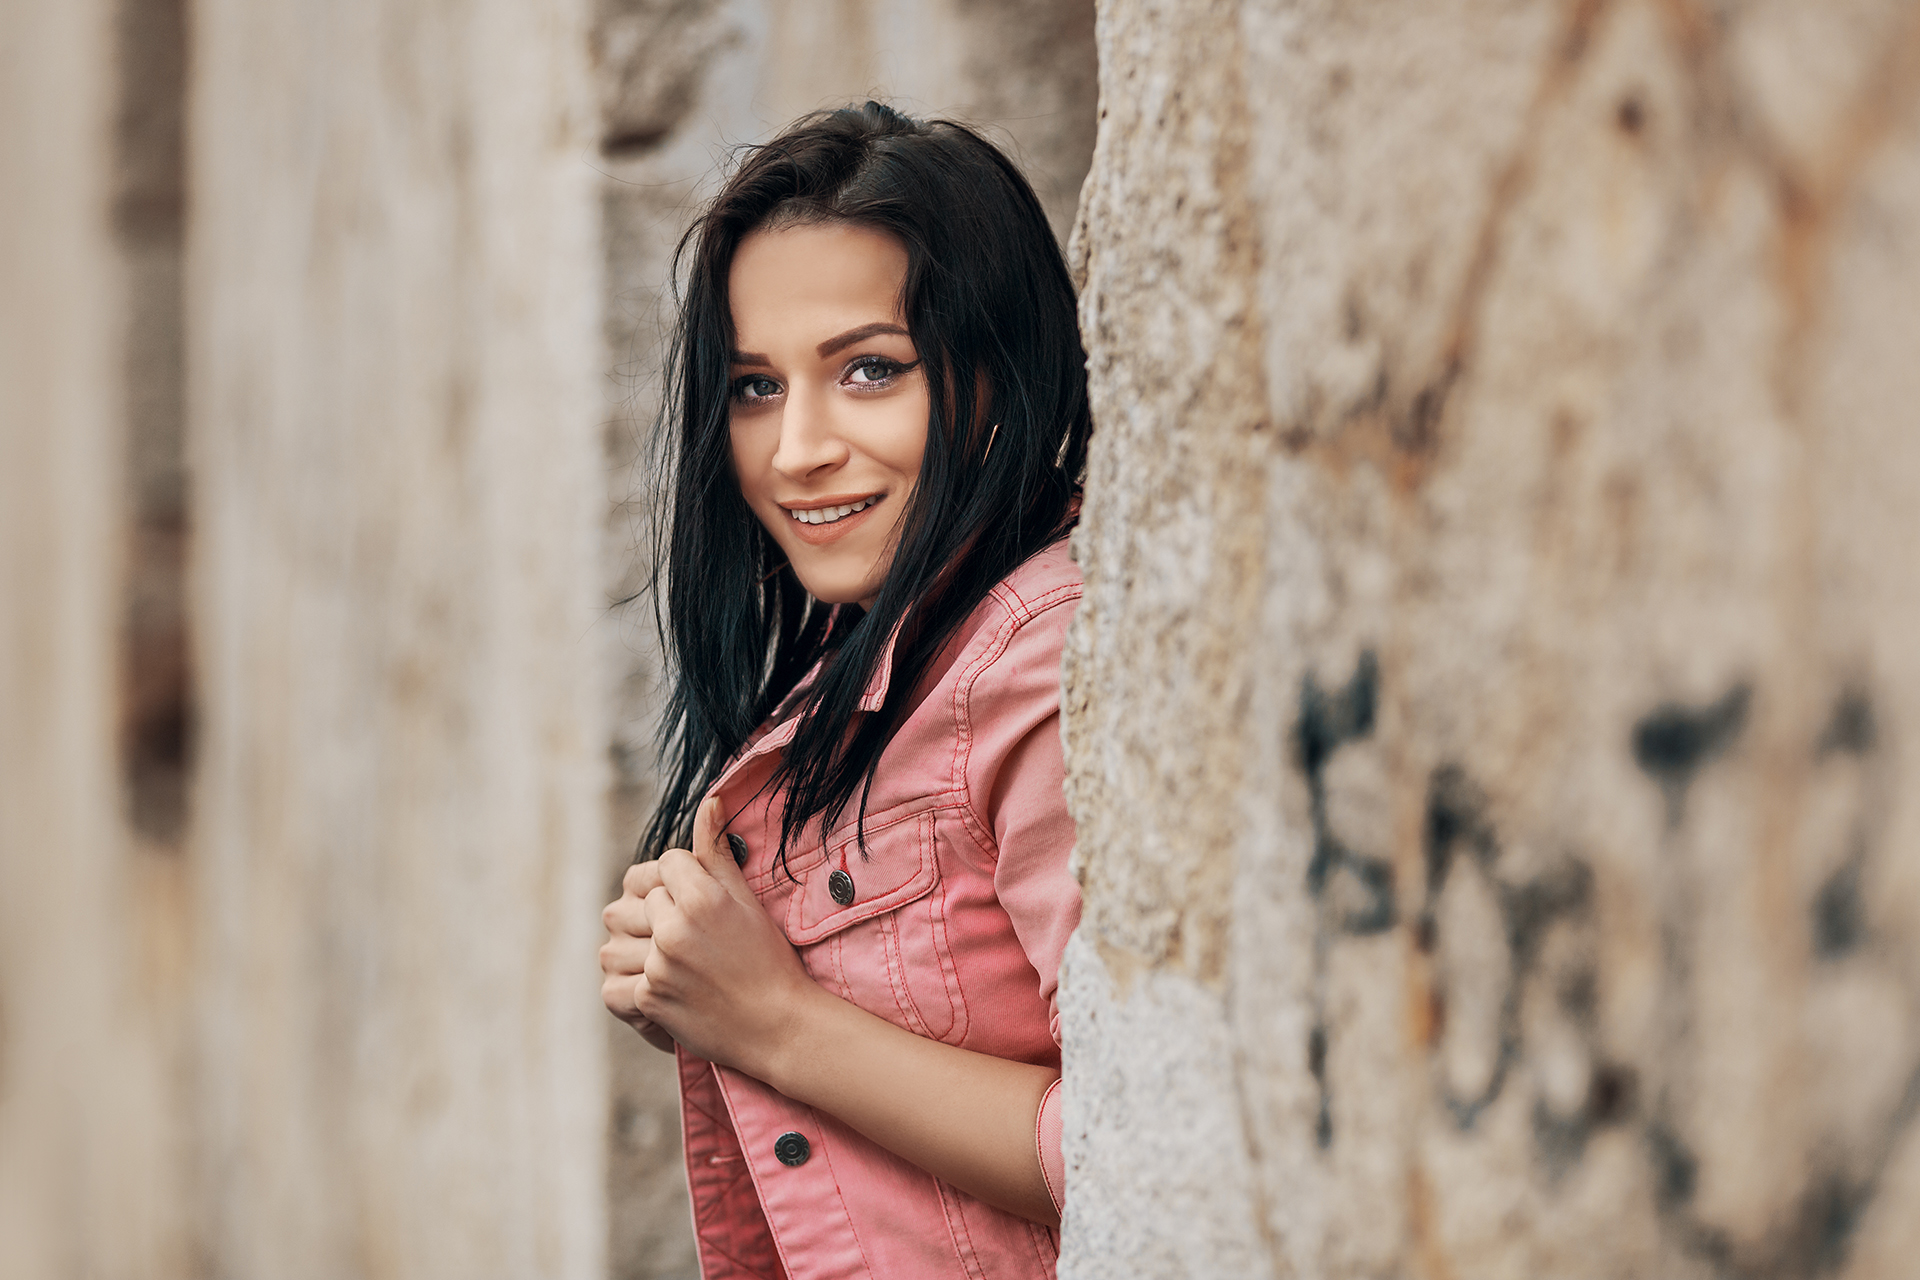 Ahoj/Szia cover girl Evelyn - Kristian Marko photography